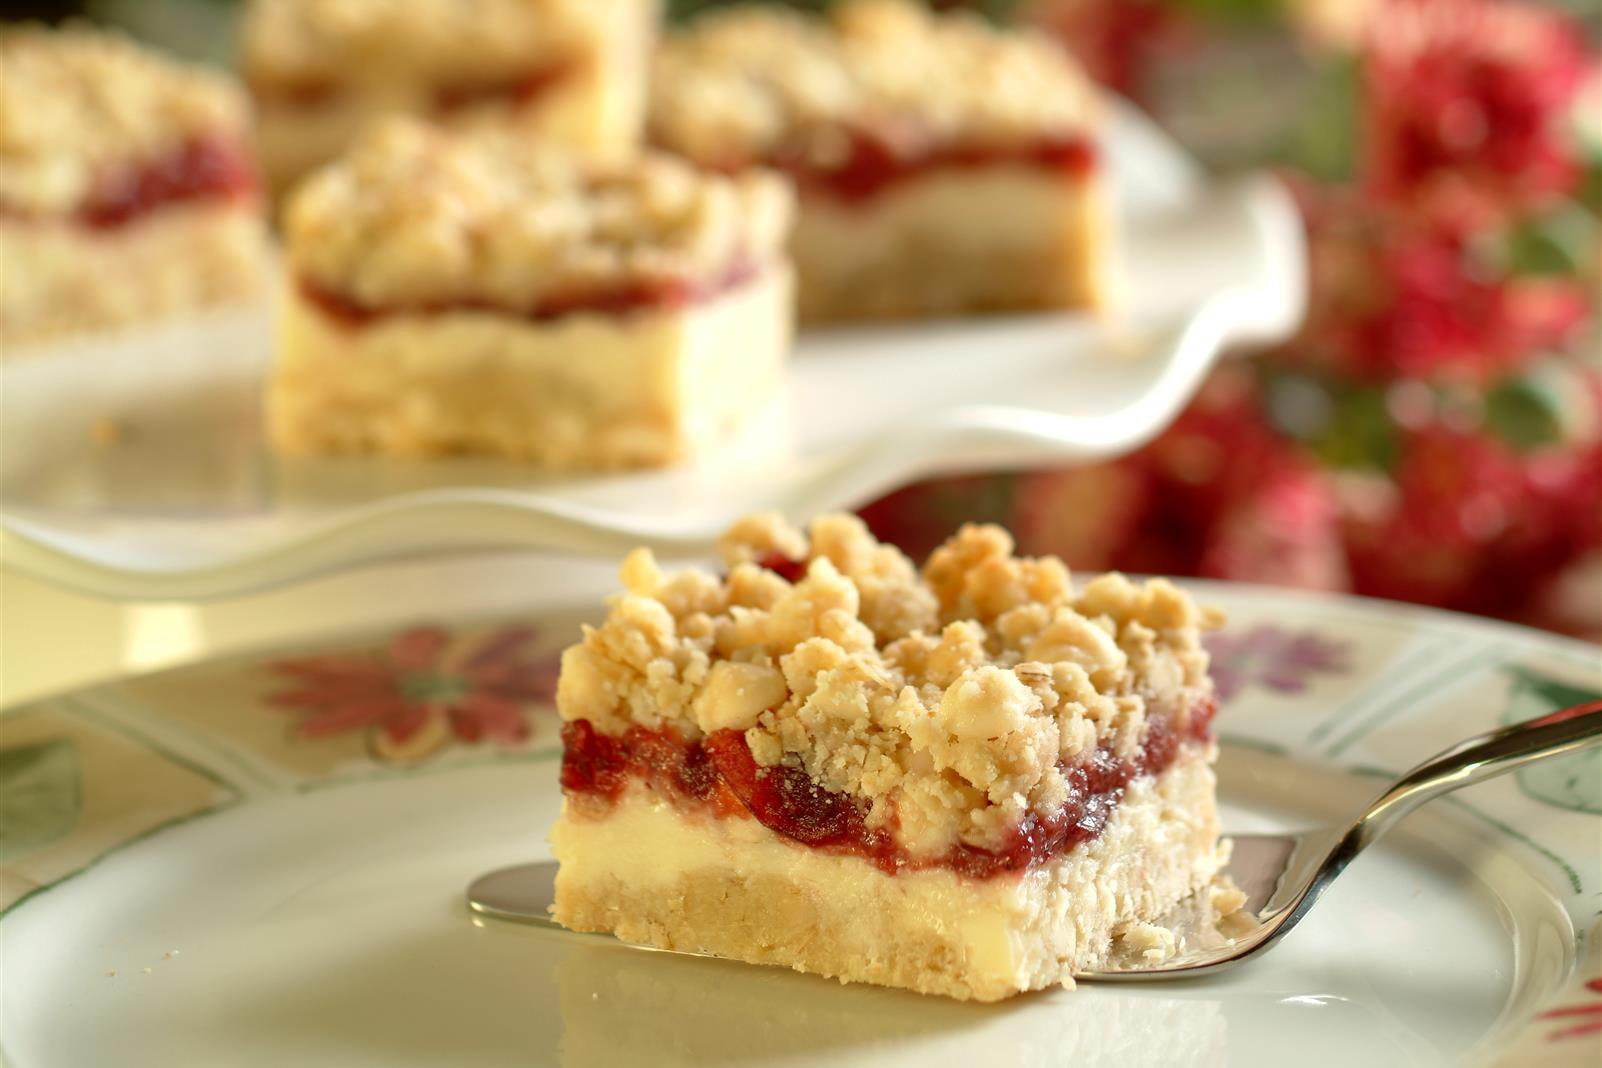 Premier Cheesecake Cranberry Bars